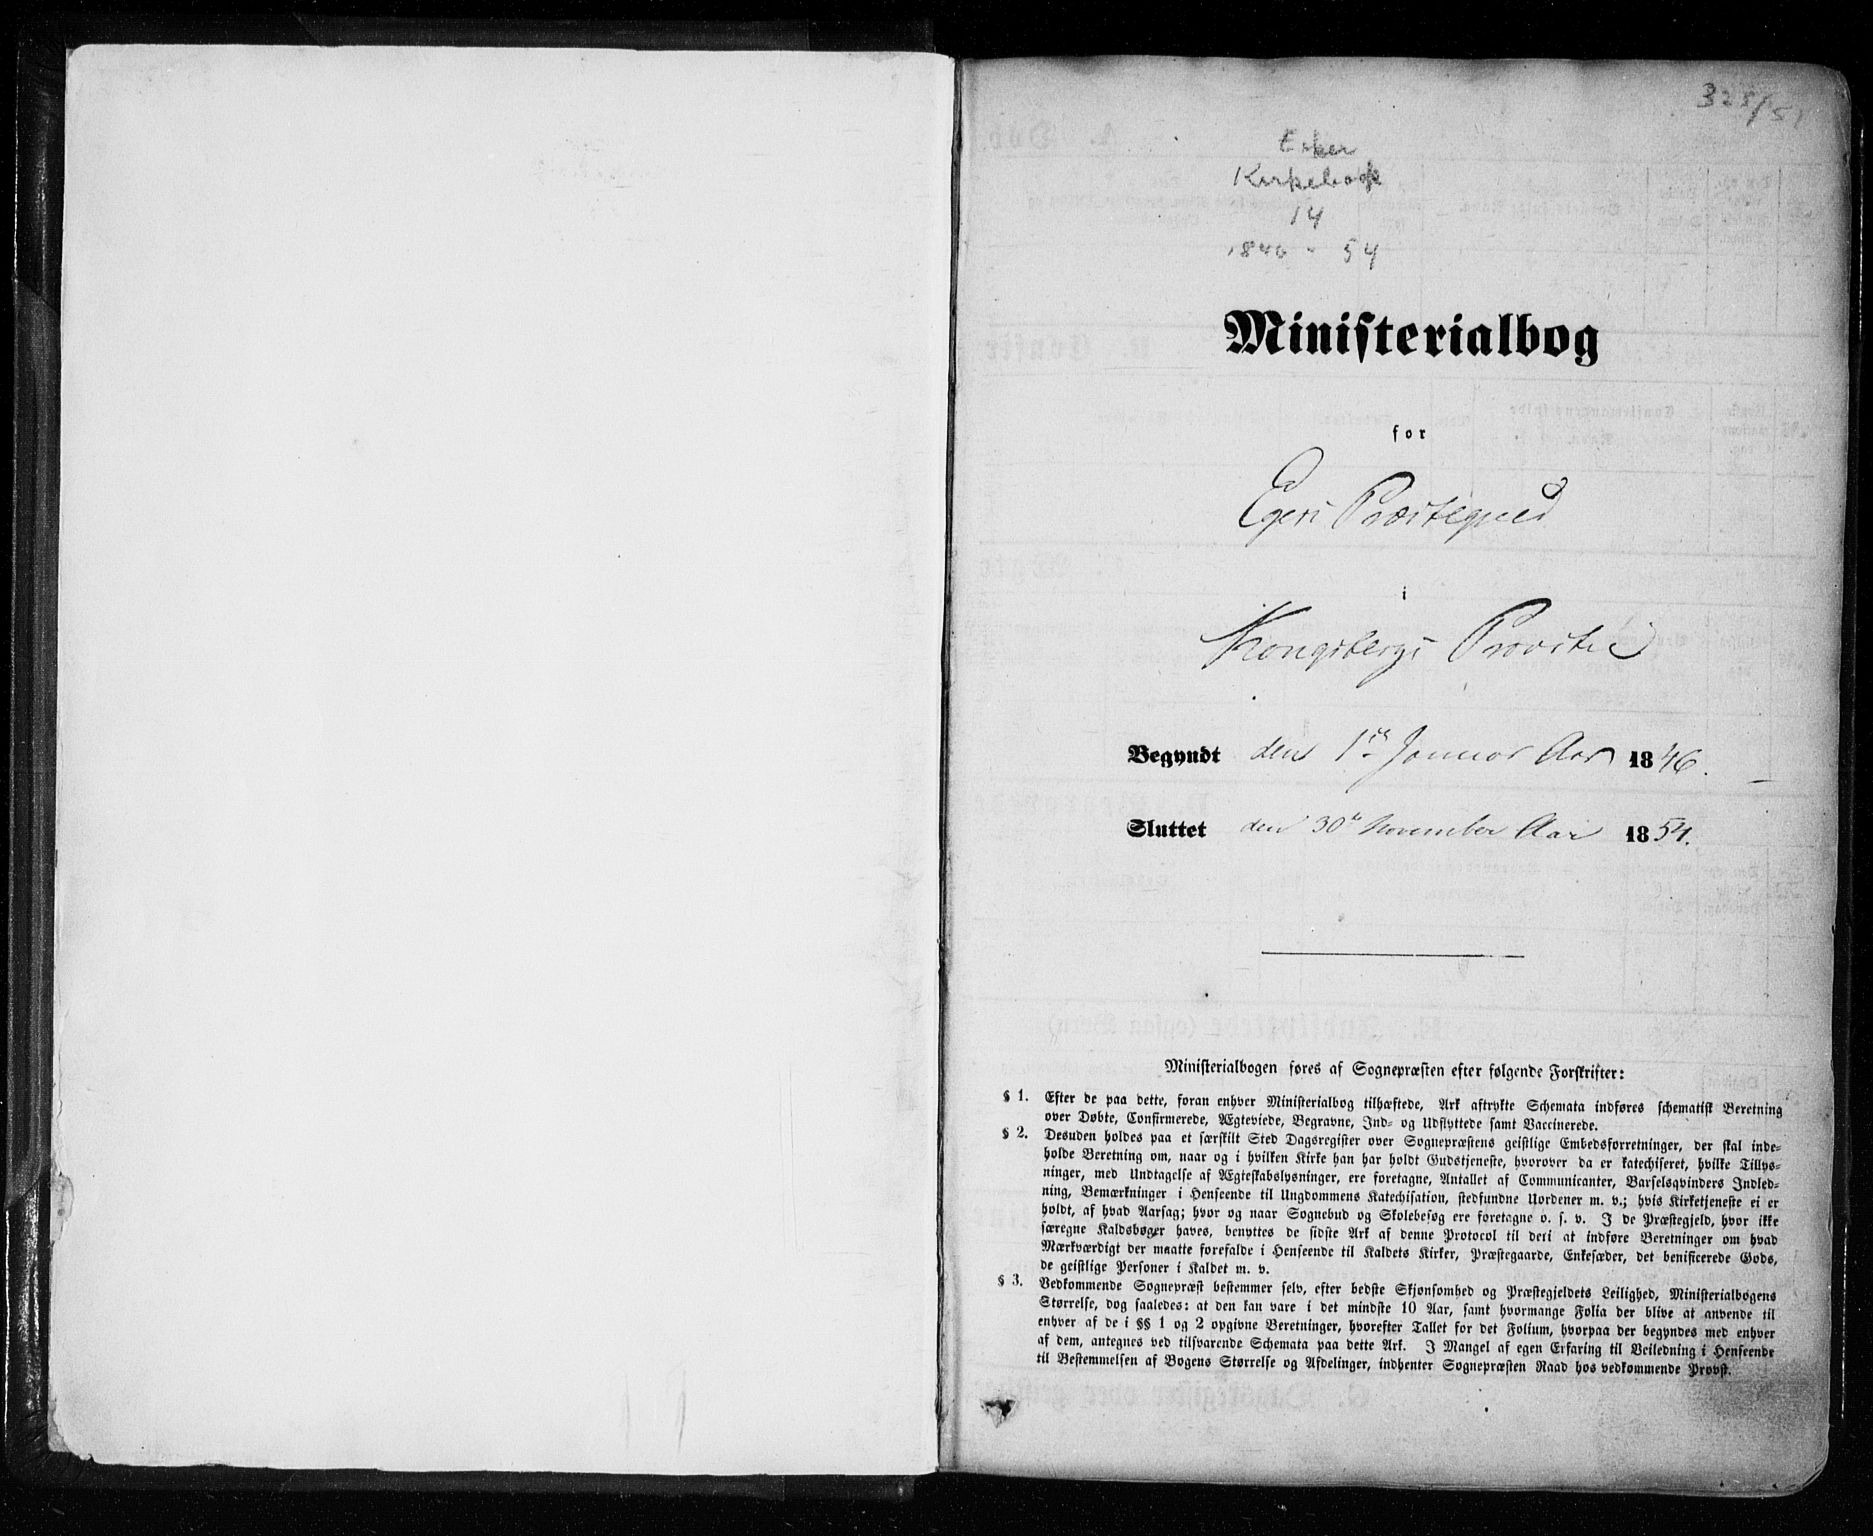 SAKO, Eiker kirkebøker, F/Fa/L0014: Ministerialbok nr. I 14, 1846-1854